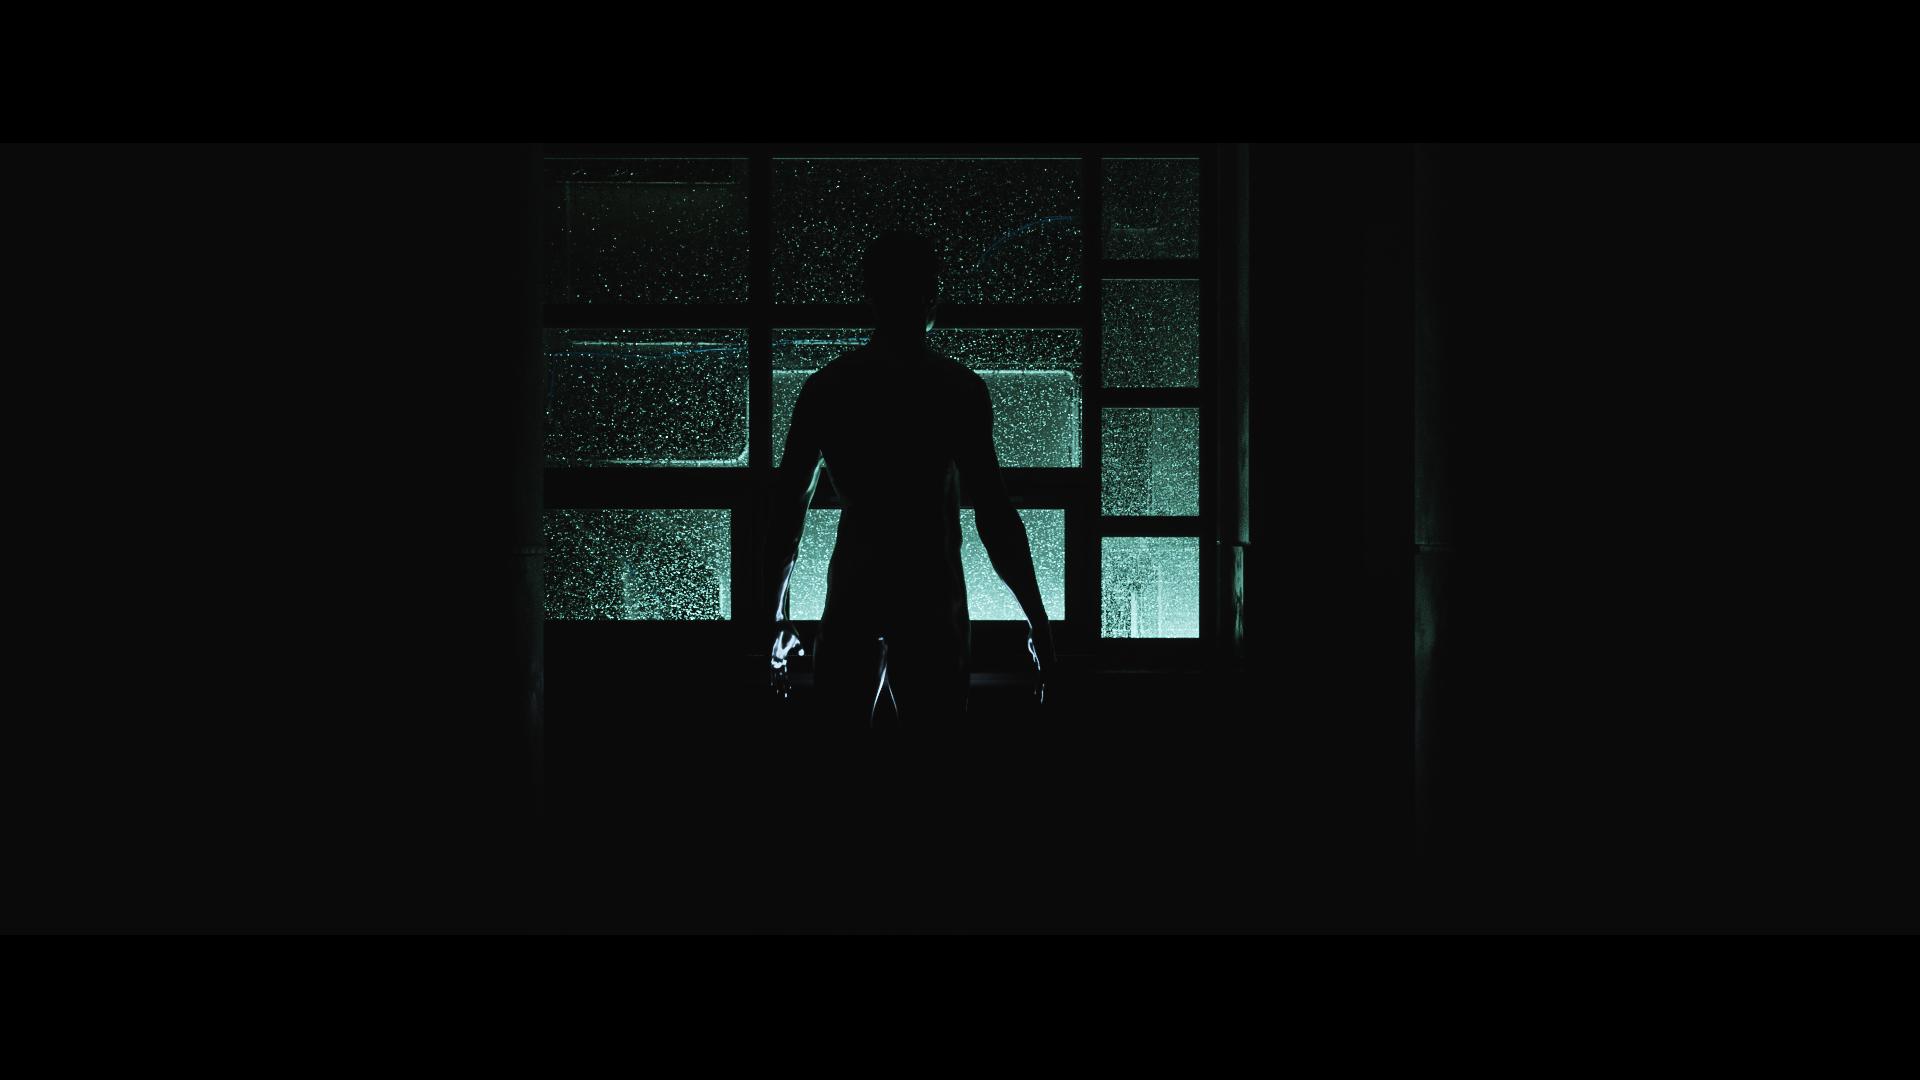 Blade Runner Bedroom_0002.jpg